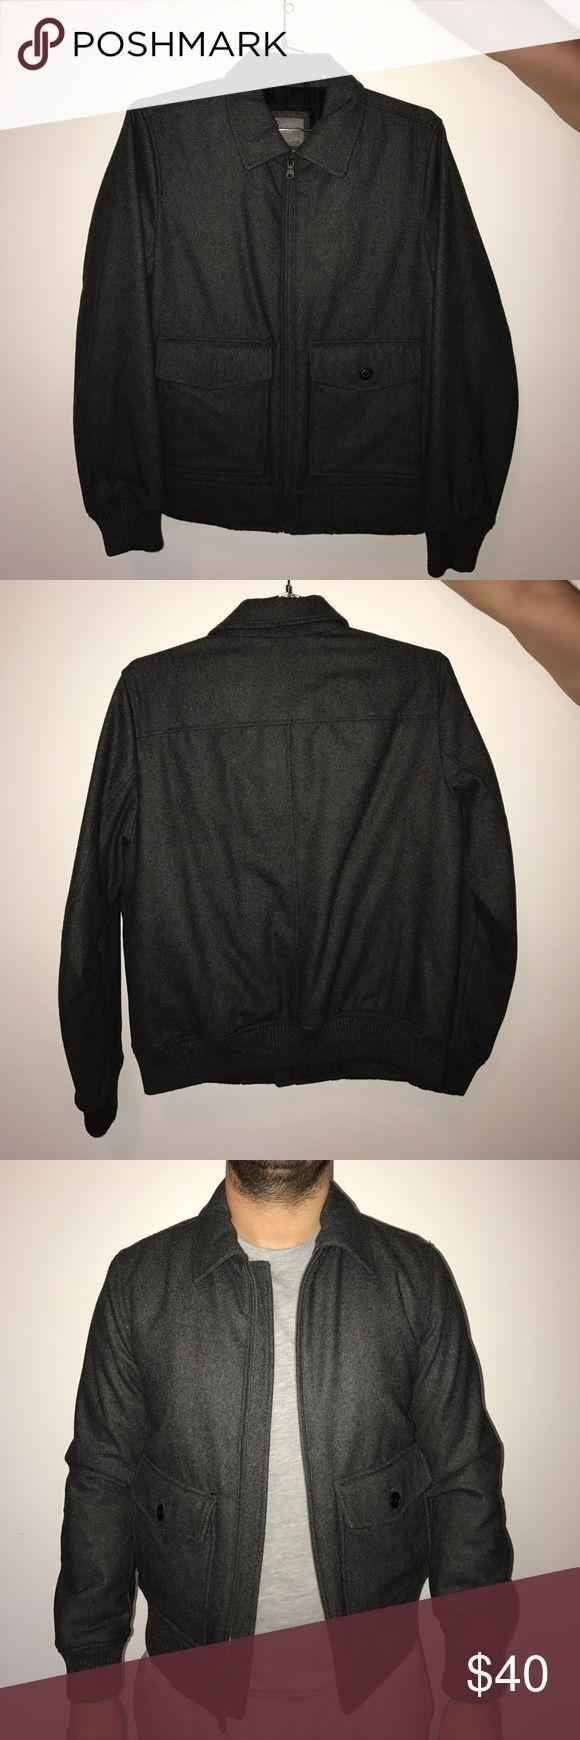 Gap Wool bomber jacket Gap dark gray wool bomber jacket. Never worn GAP Jackets & Coats Bomber & Varsity